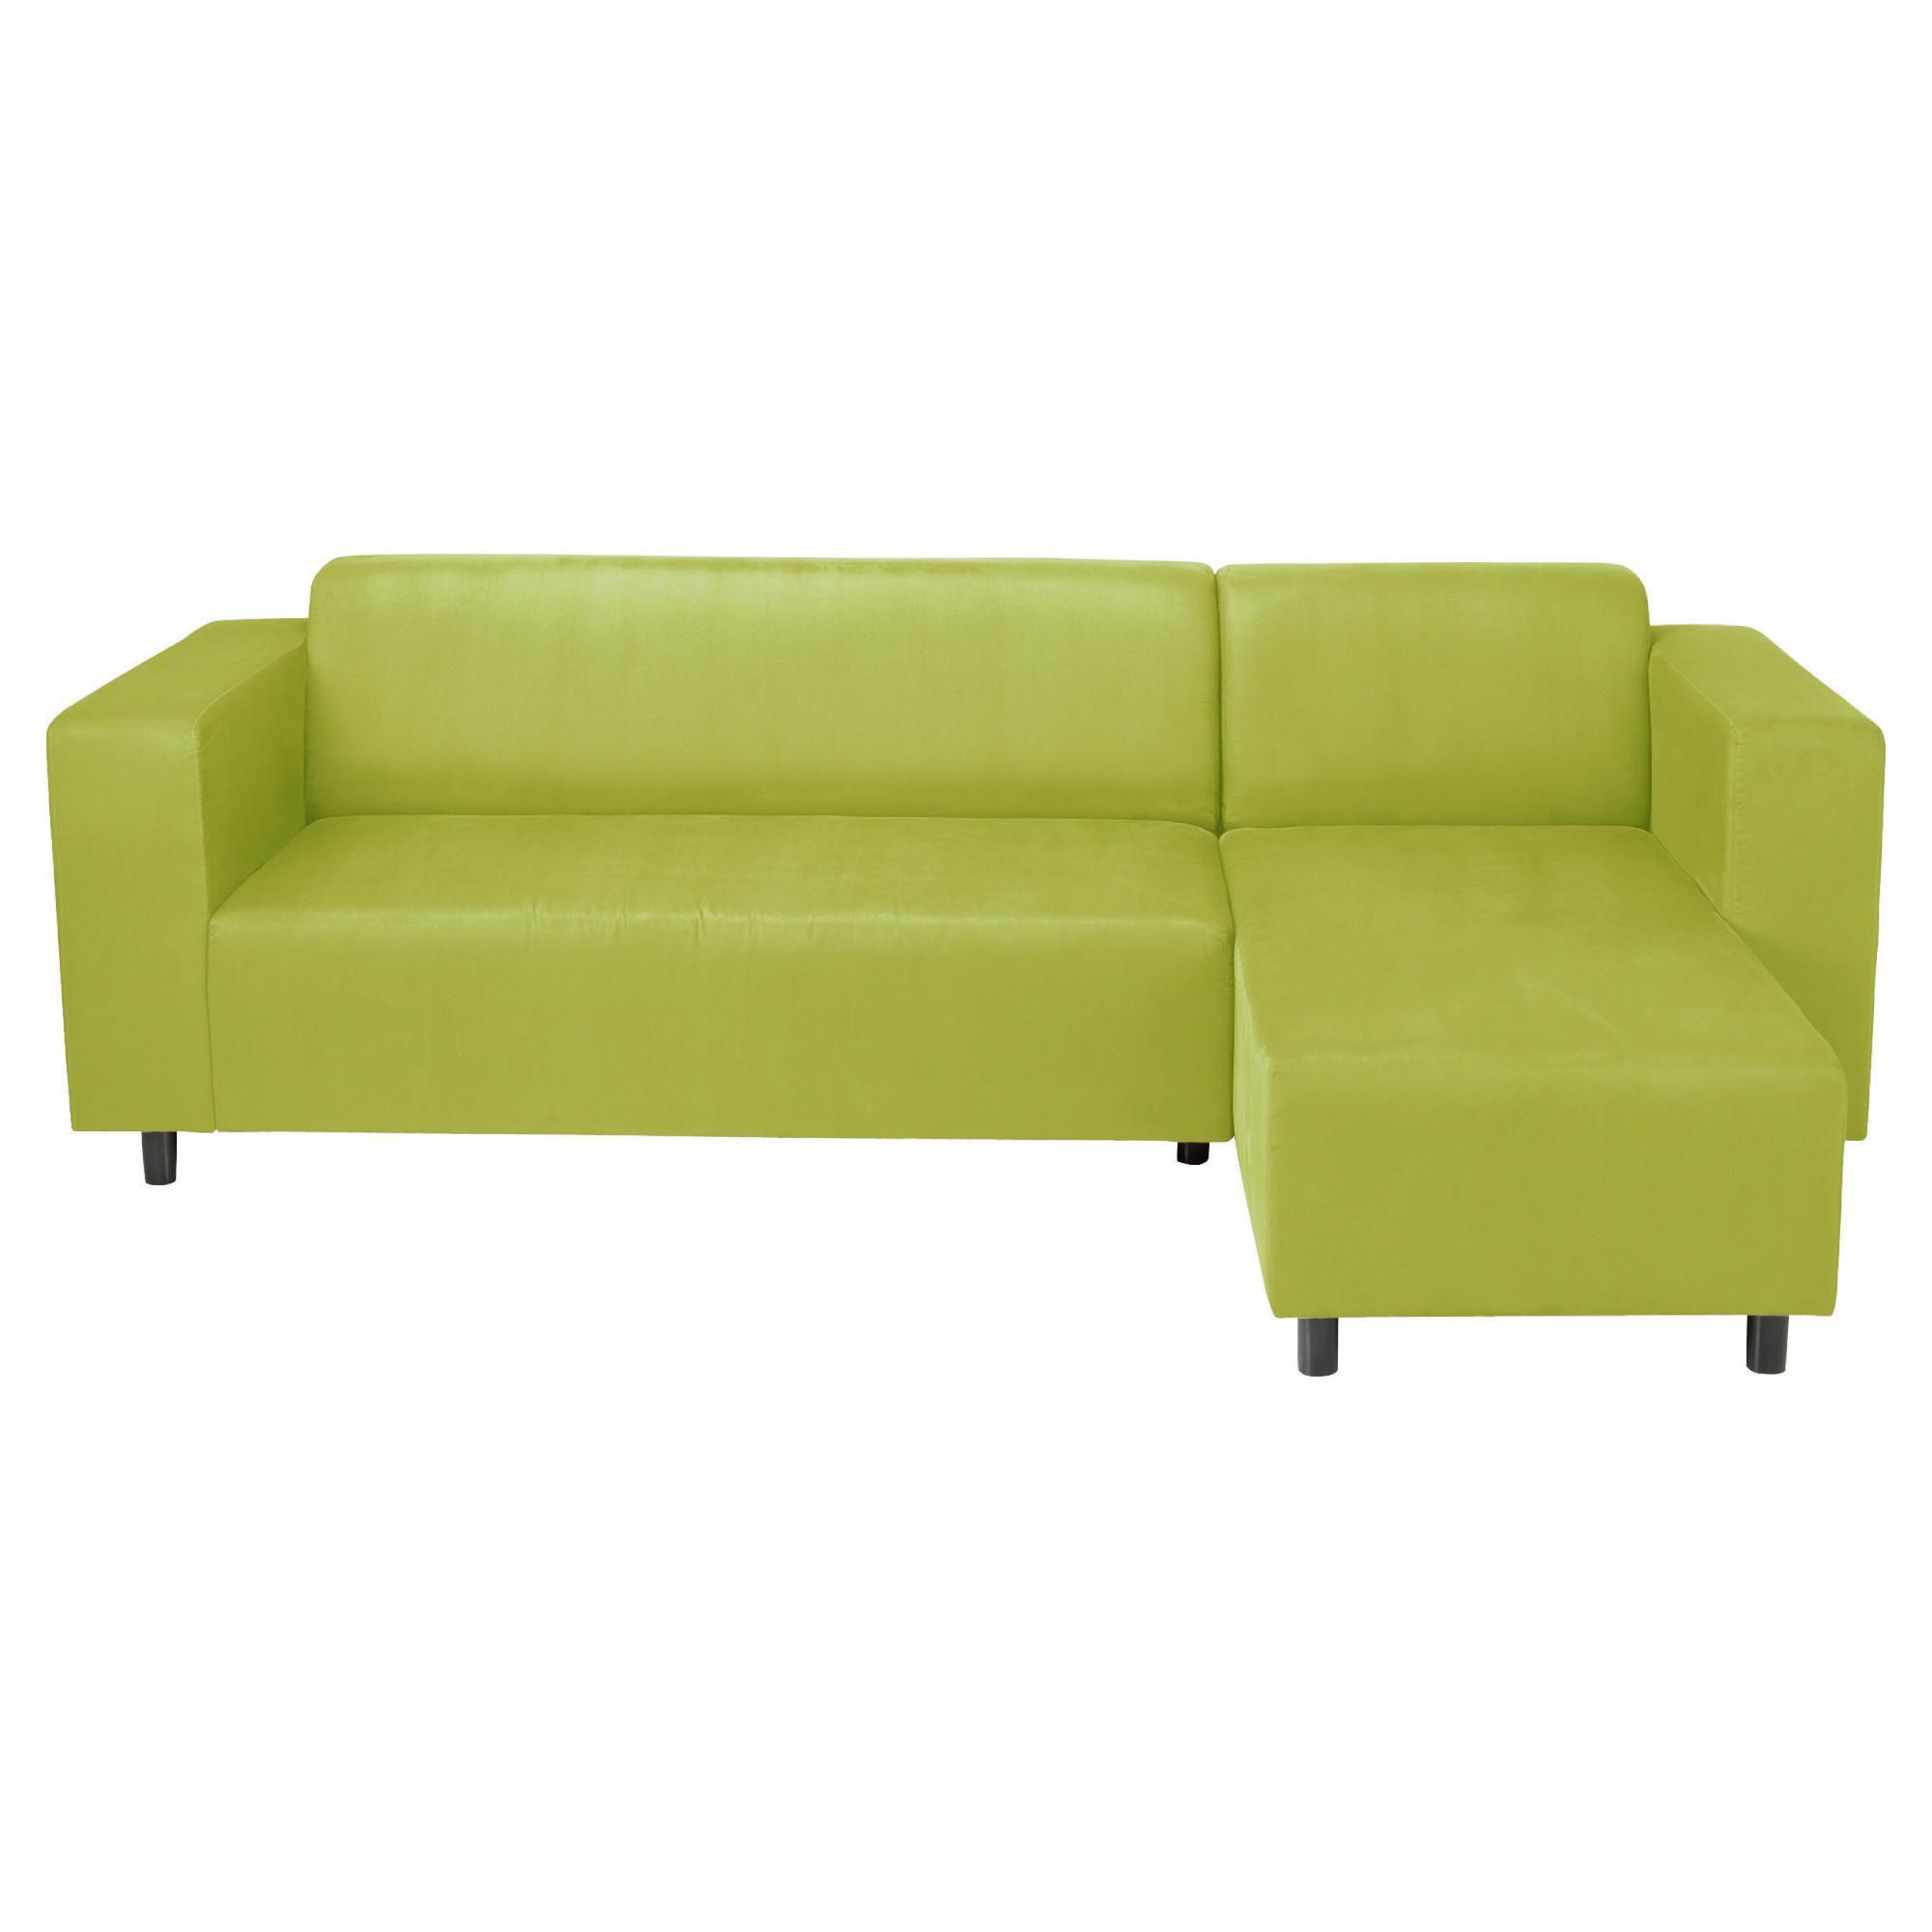 Lime Green Sofas Sofa Rooms TheSofa